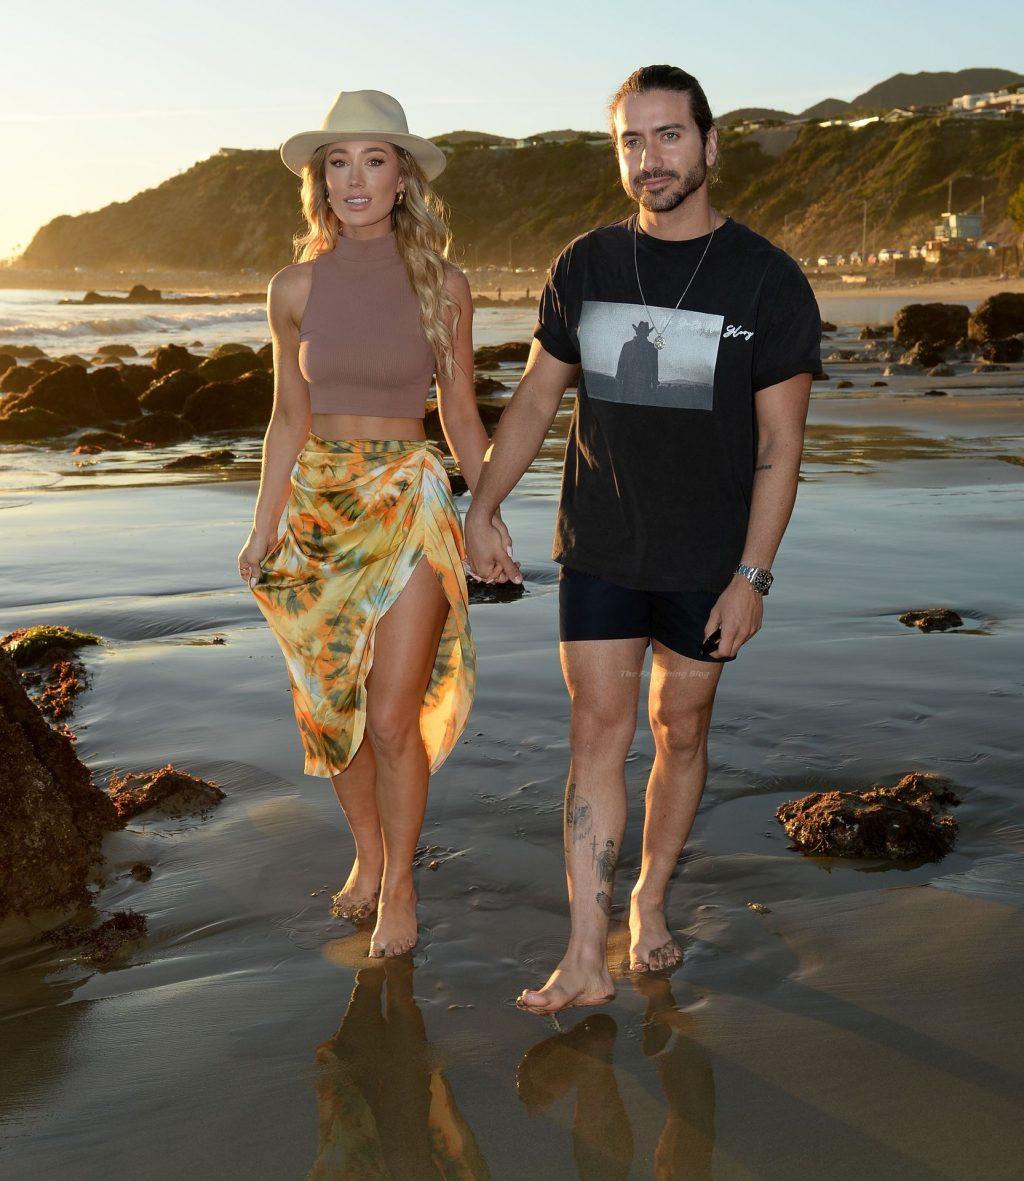 Robbi Jan & Alex Costa Enjoy a Day on the Beach (16 Photos)